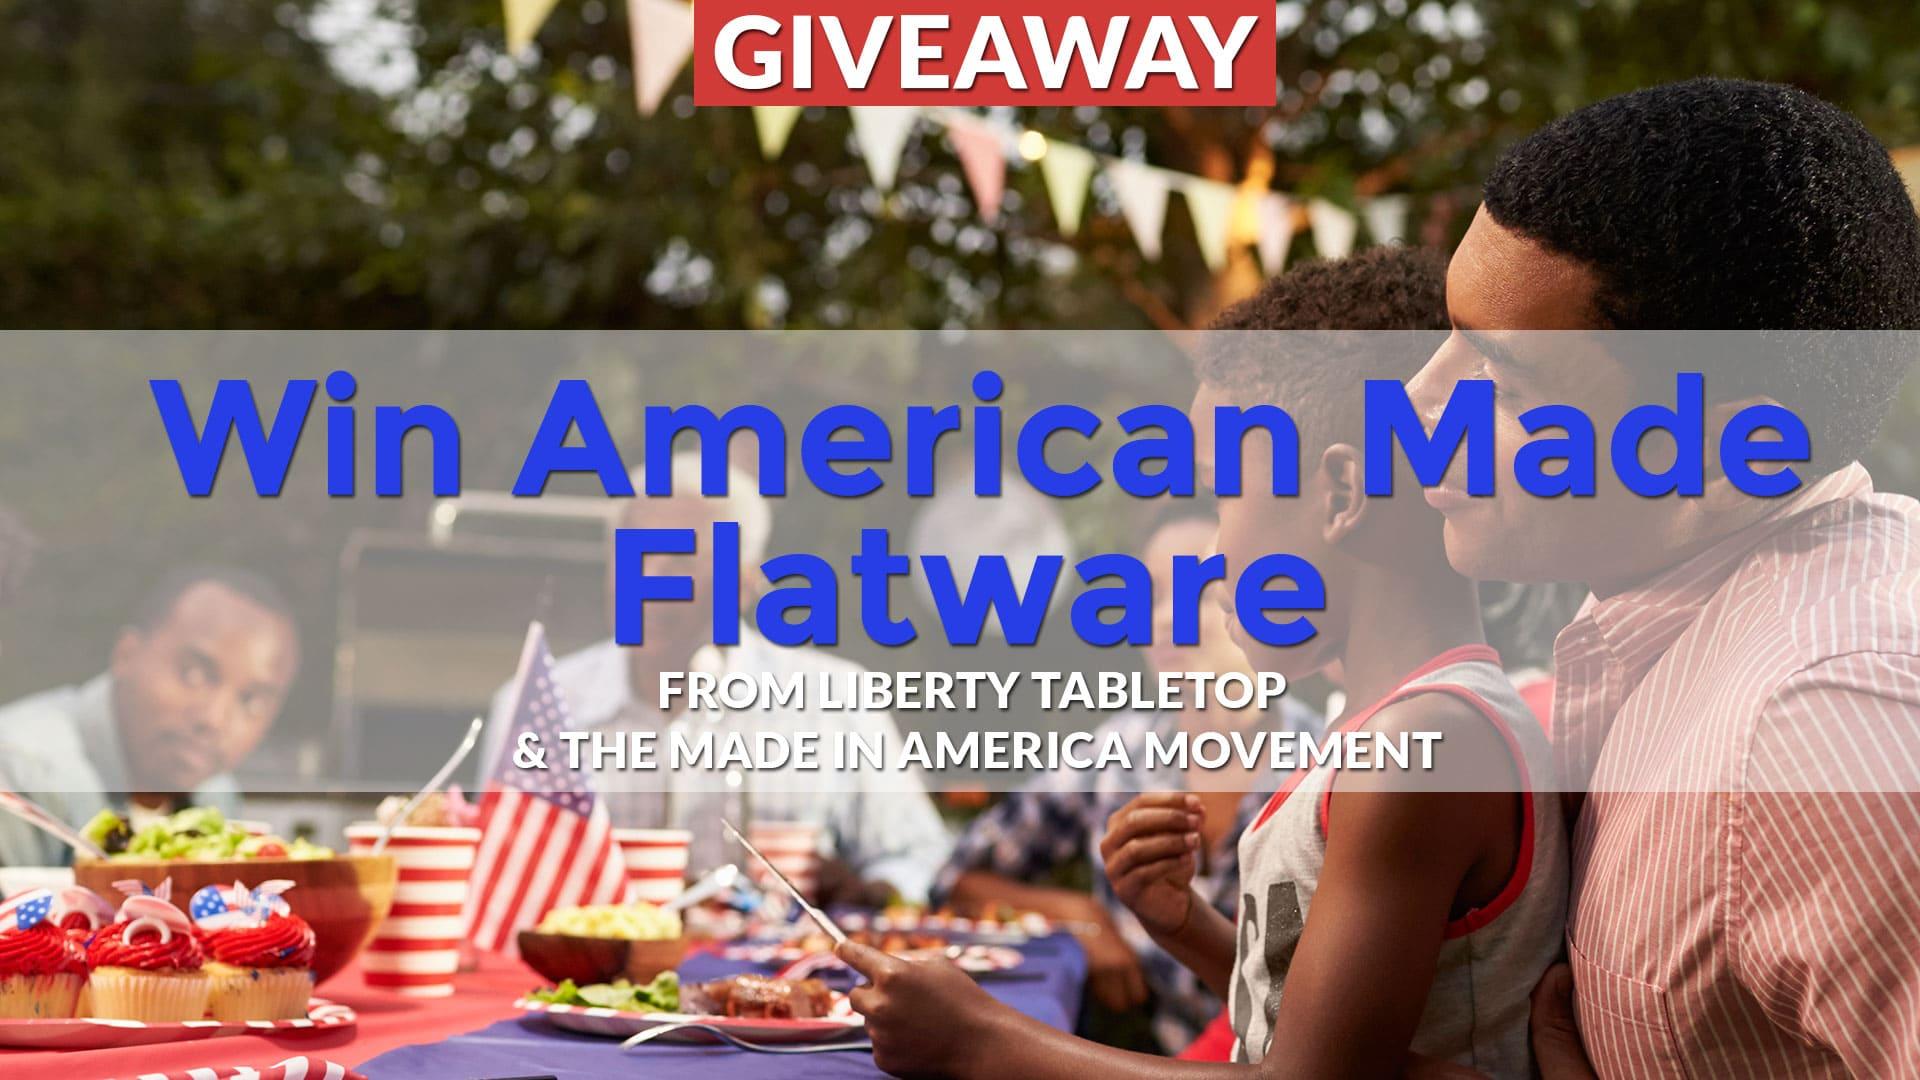 American Made Flatware, Made in USA Flatware, Made in America Week, Made in America Day, Made in America Month, Made in USA Week, Made in USA Month, made in usa products list, made in america products list, american made products list